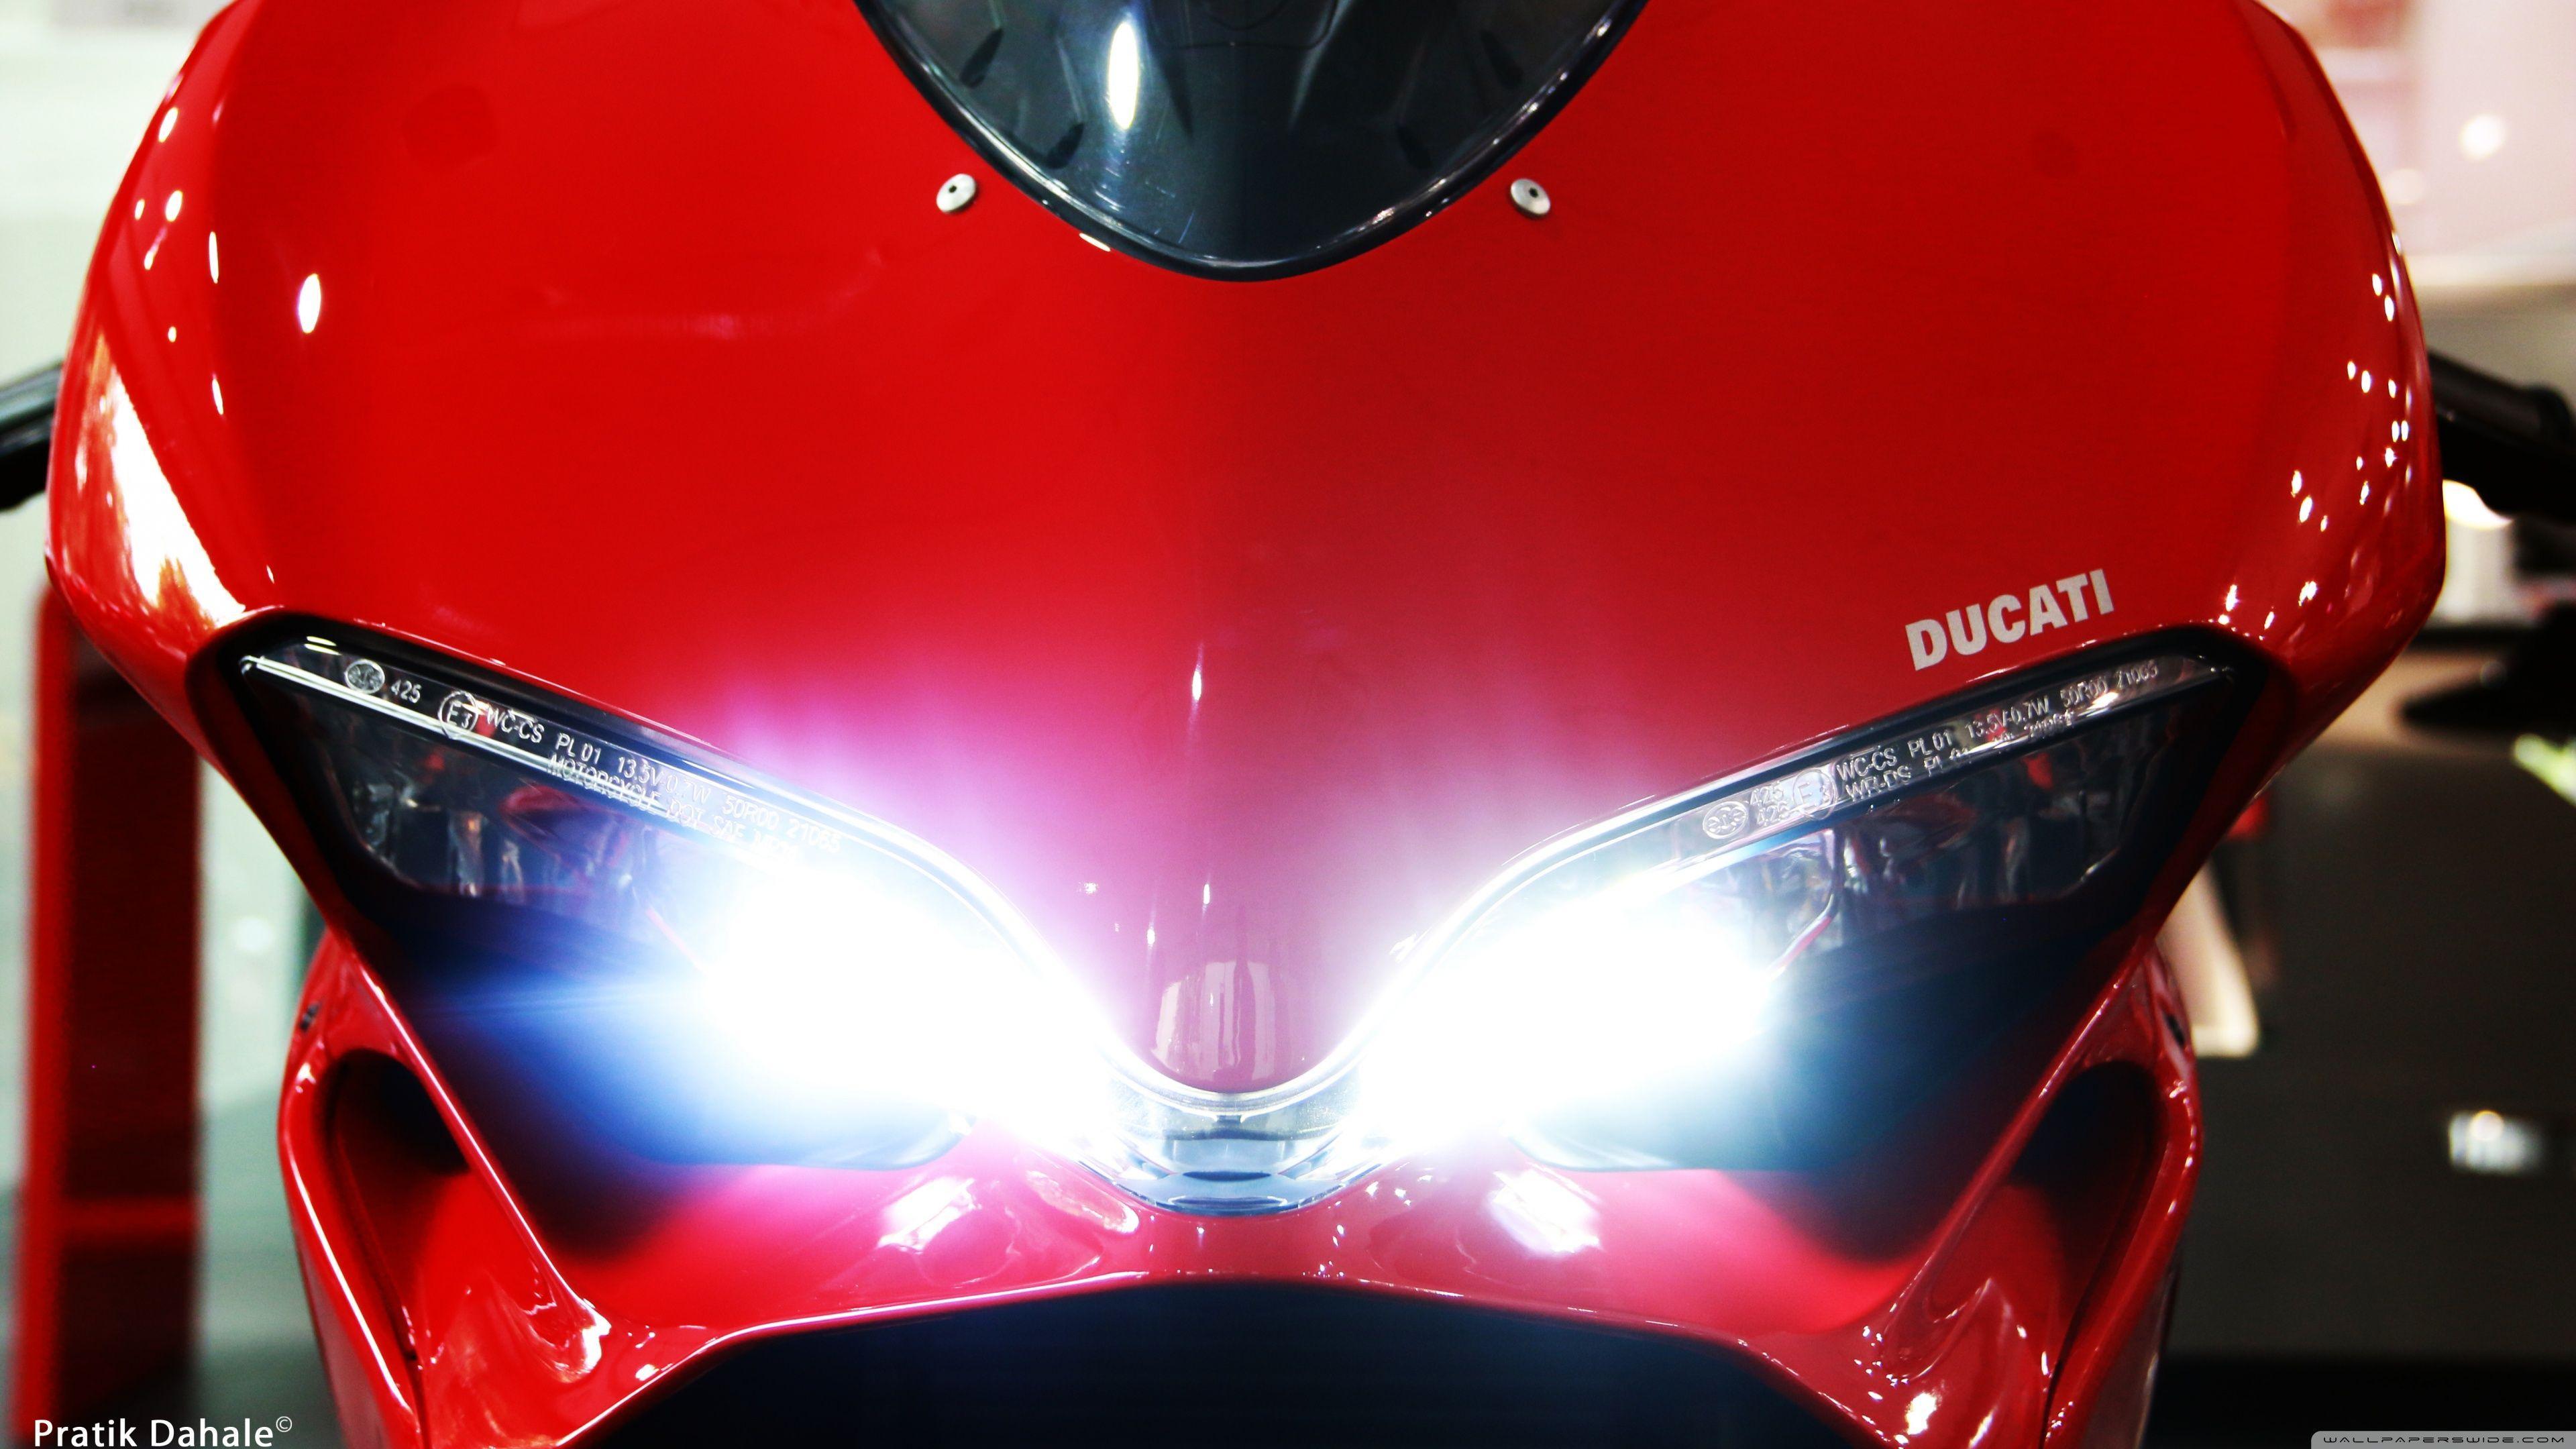 Ducati 4k Wallpapers Top Free Ducati 4k Backgrounds